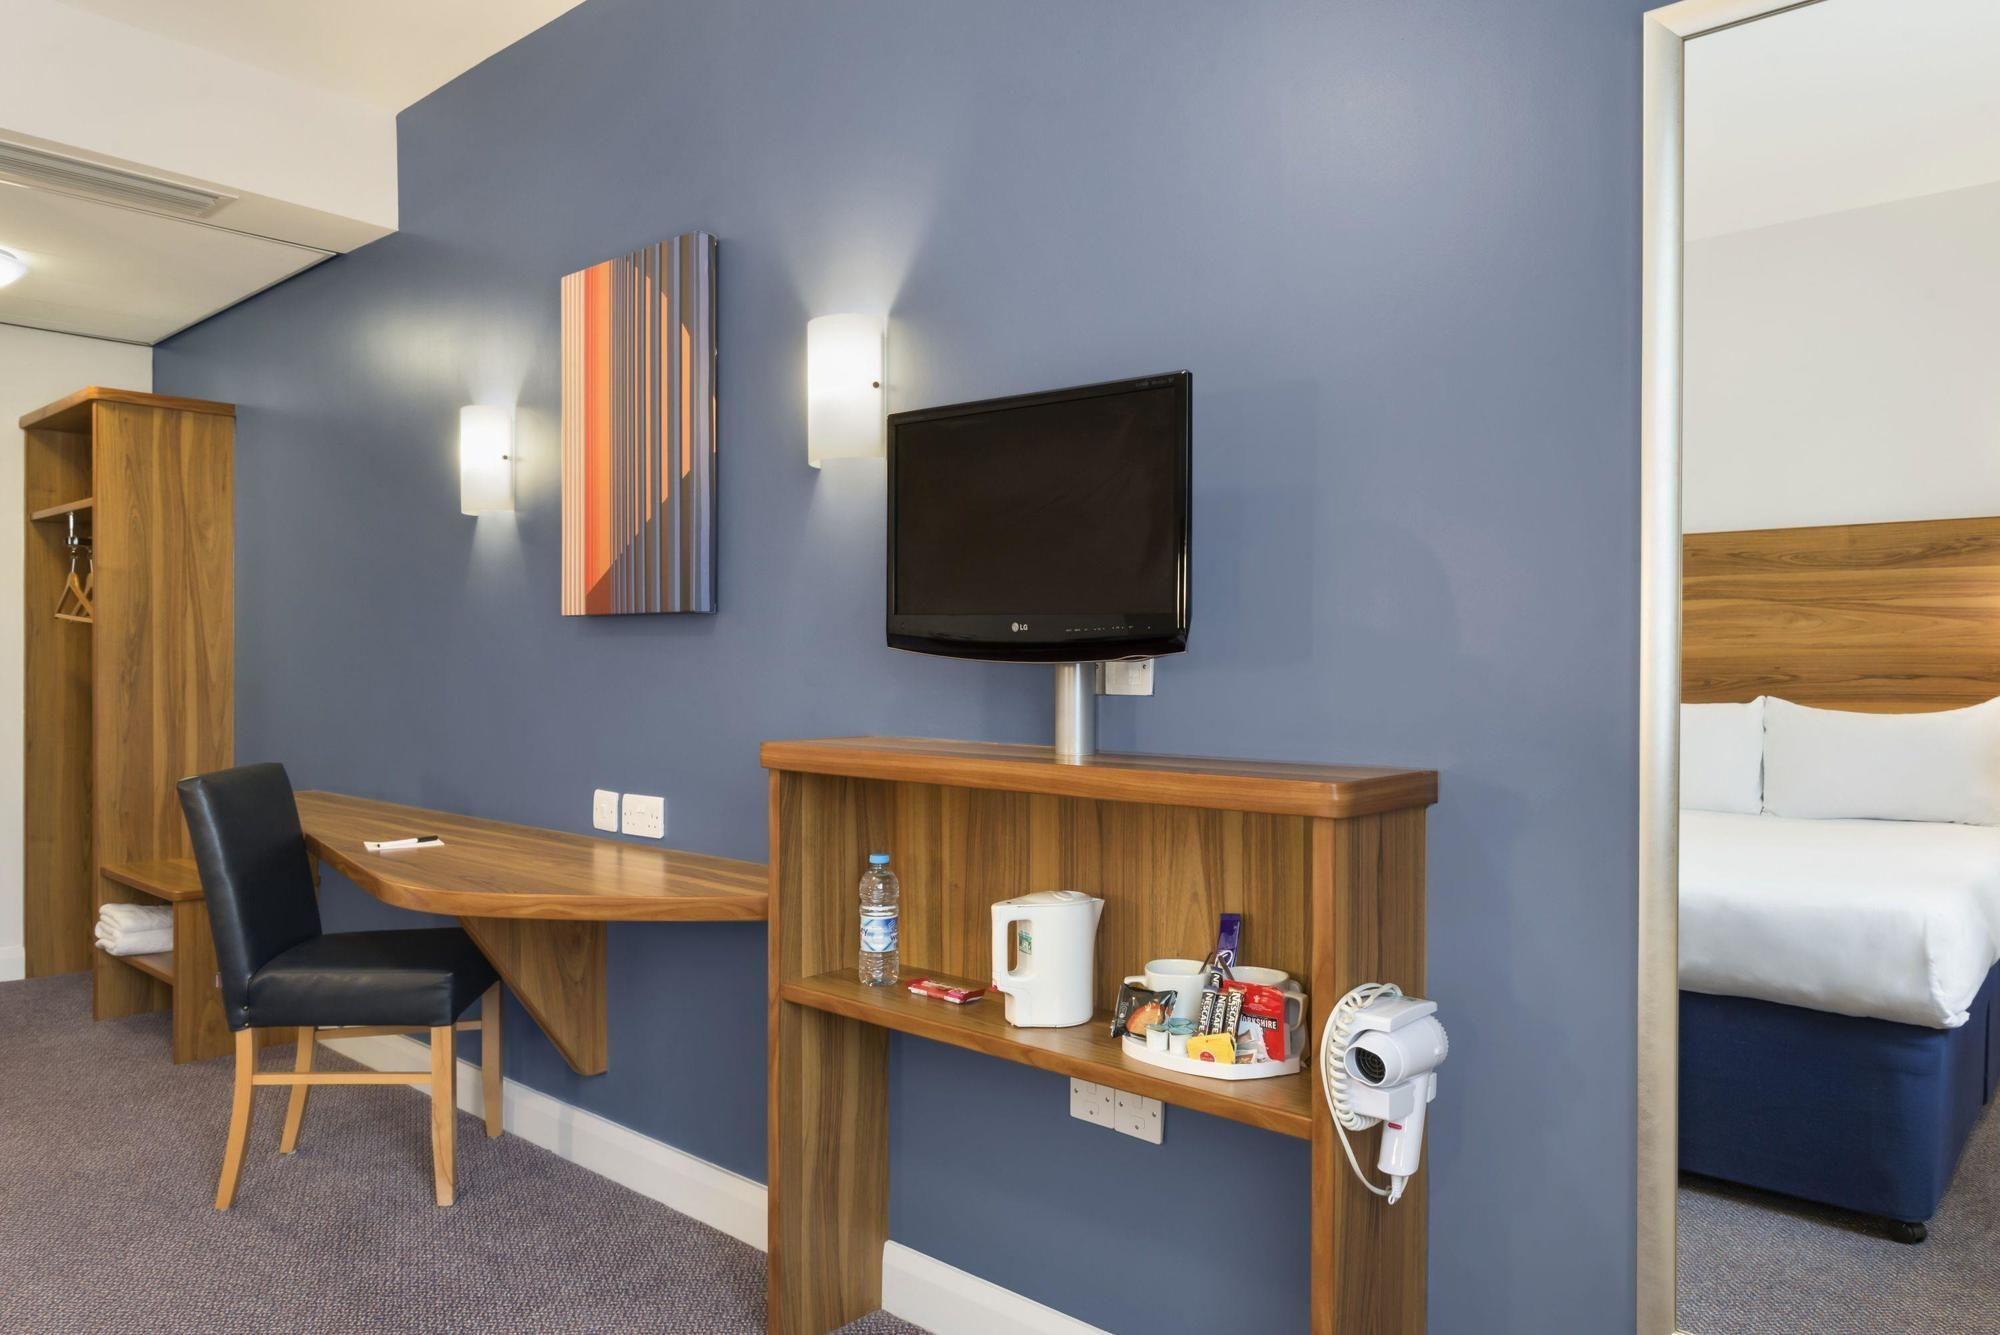 Days Inn by Wyndham Corley NEC M6, Warwickshire